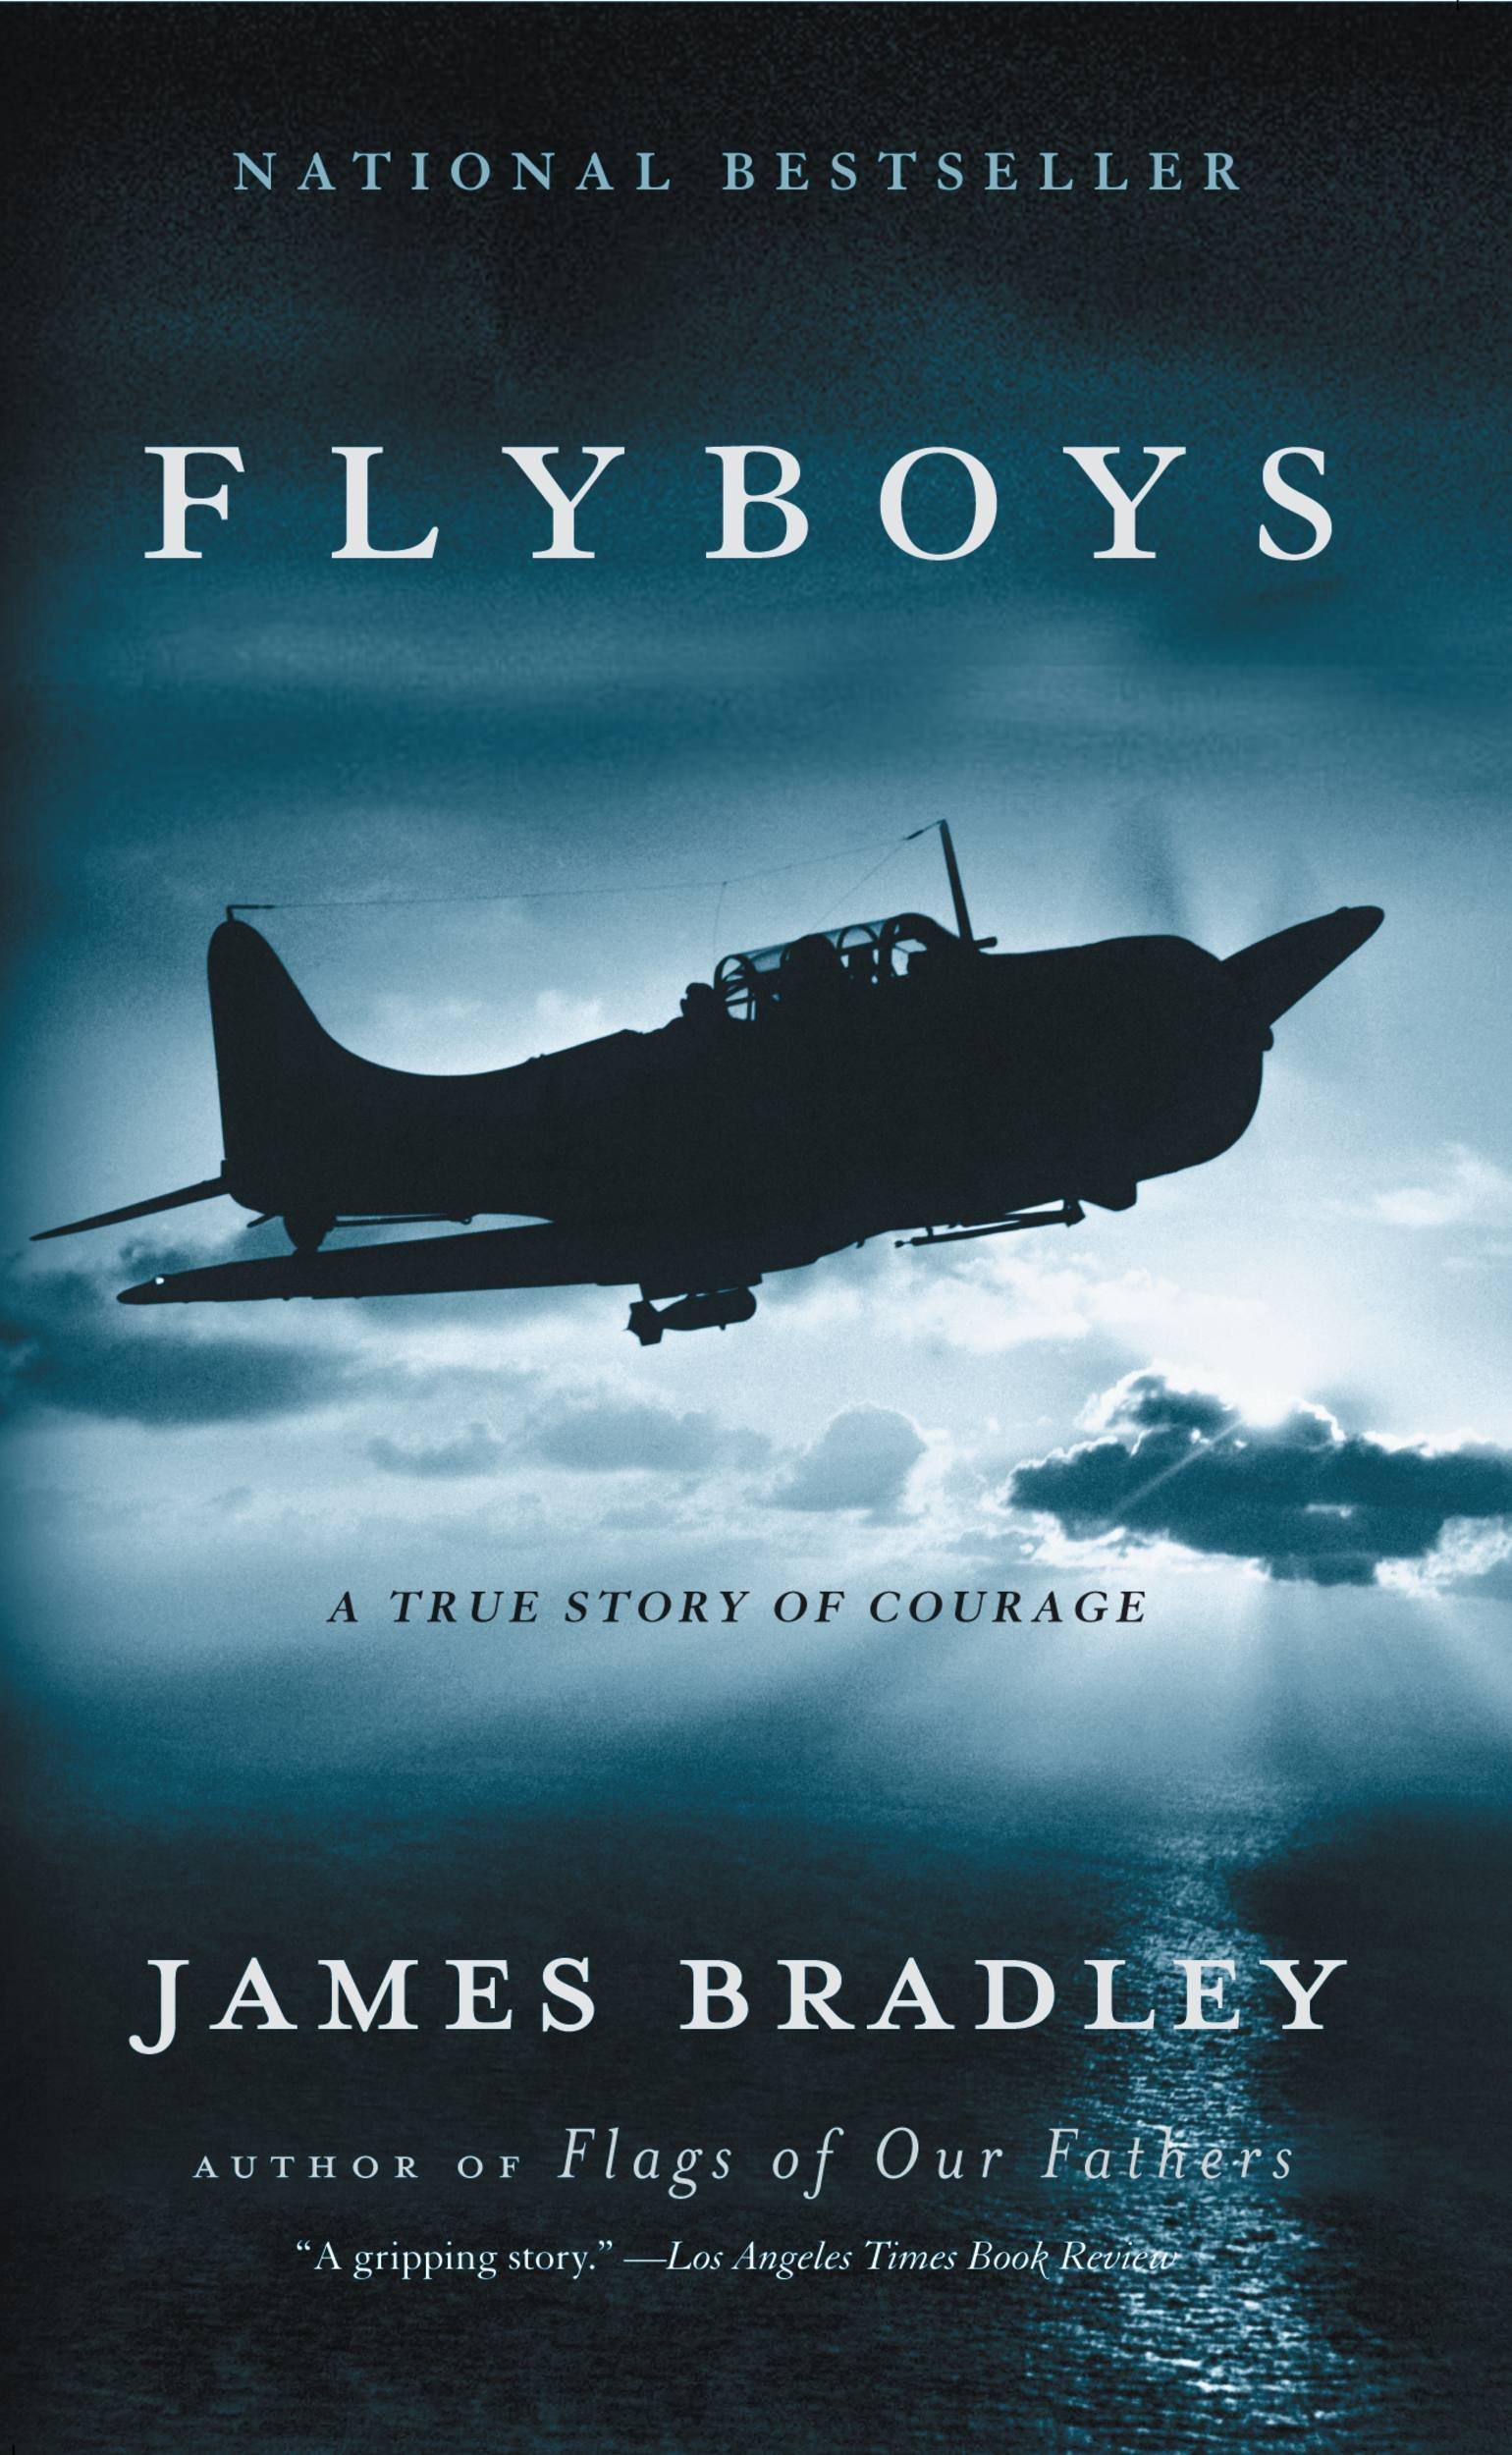 Flyboys, by James Bradley